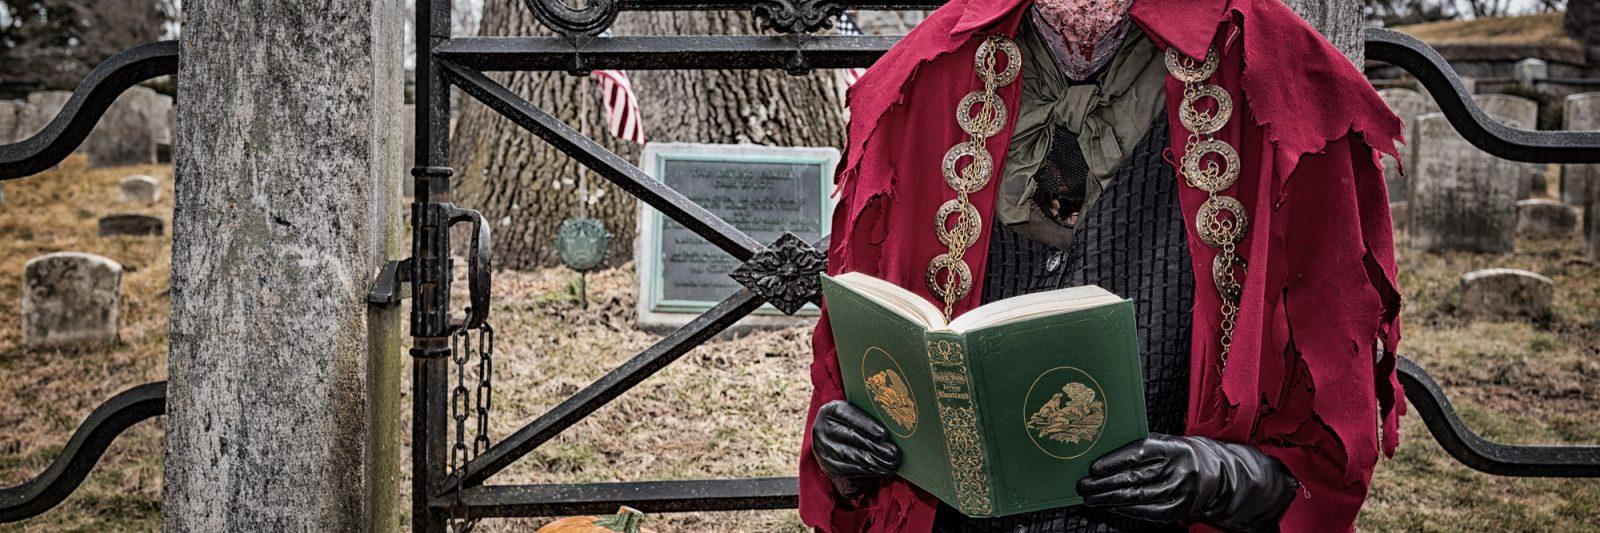 Headless Horseman reading The Legend of Sleepy Hollow at grave of Washington Irving